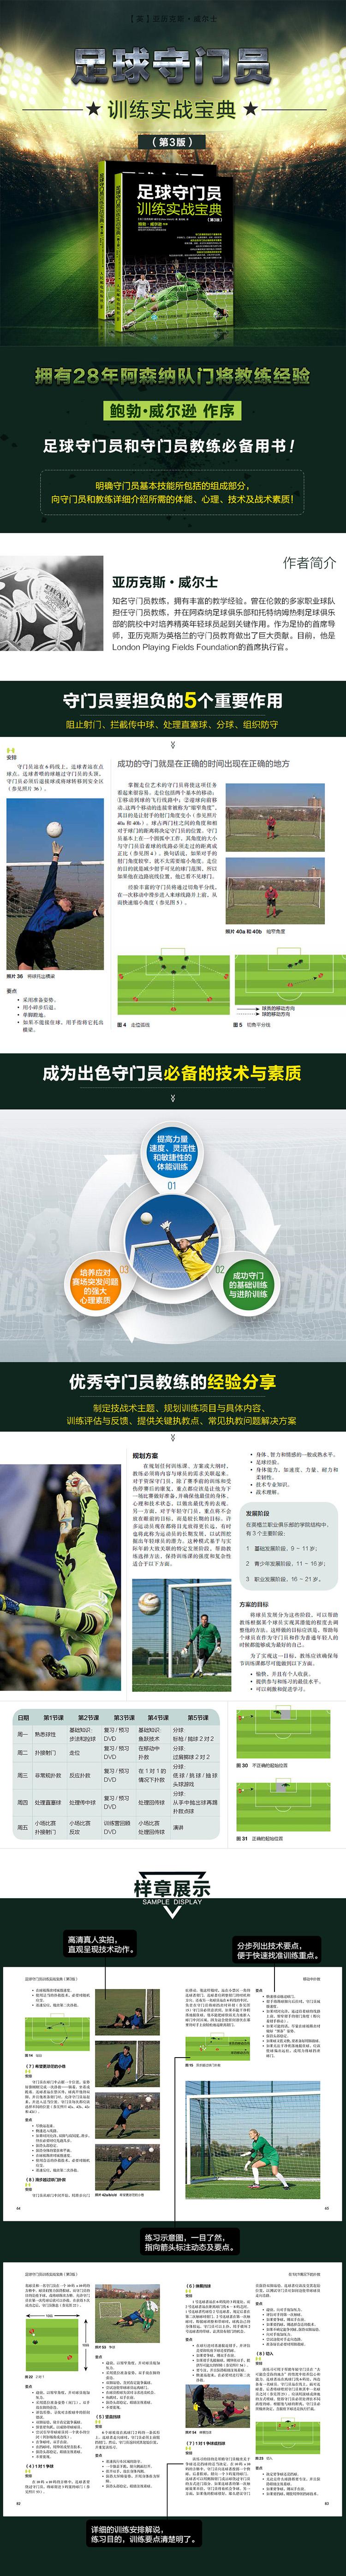 yy游戏大厅下载官方版_yy游戏大厅怎么进西西软件下载上海棋牌游戏大厅